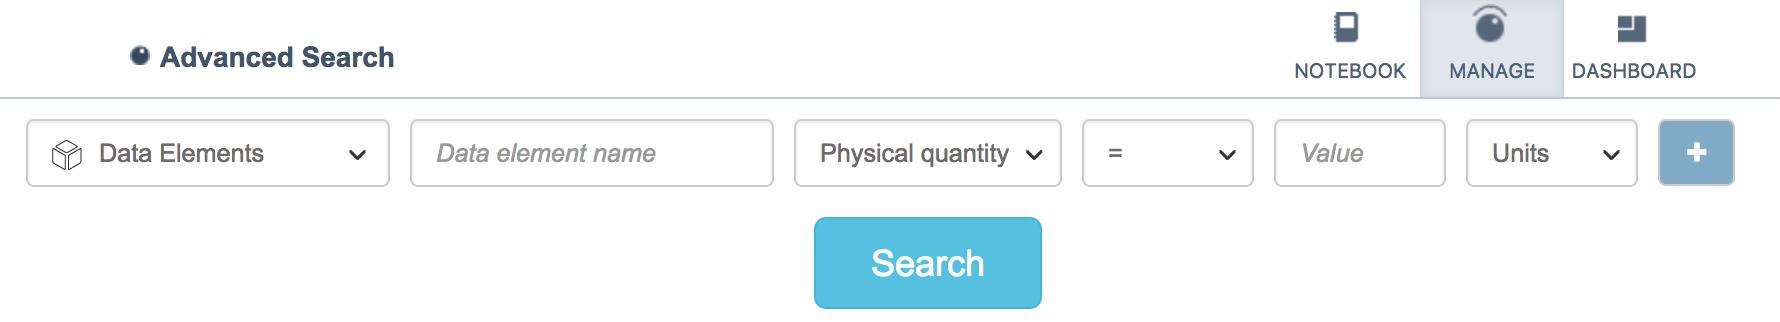 ELN data elements advanced search